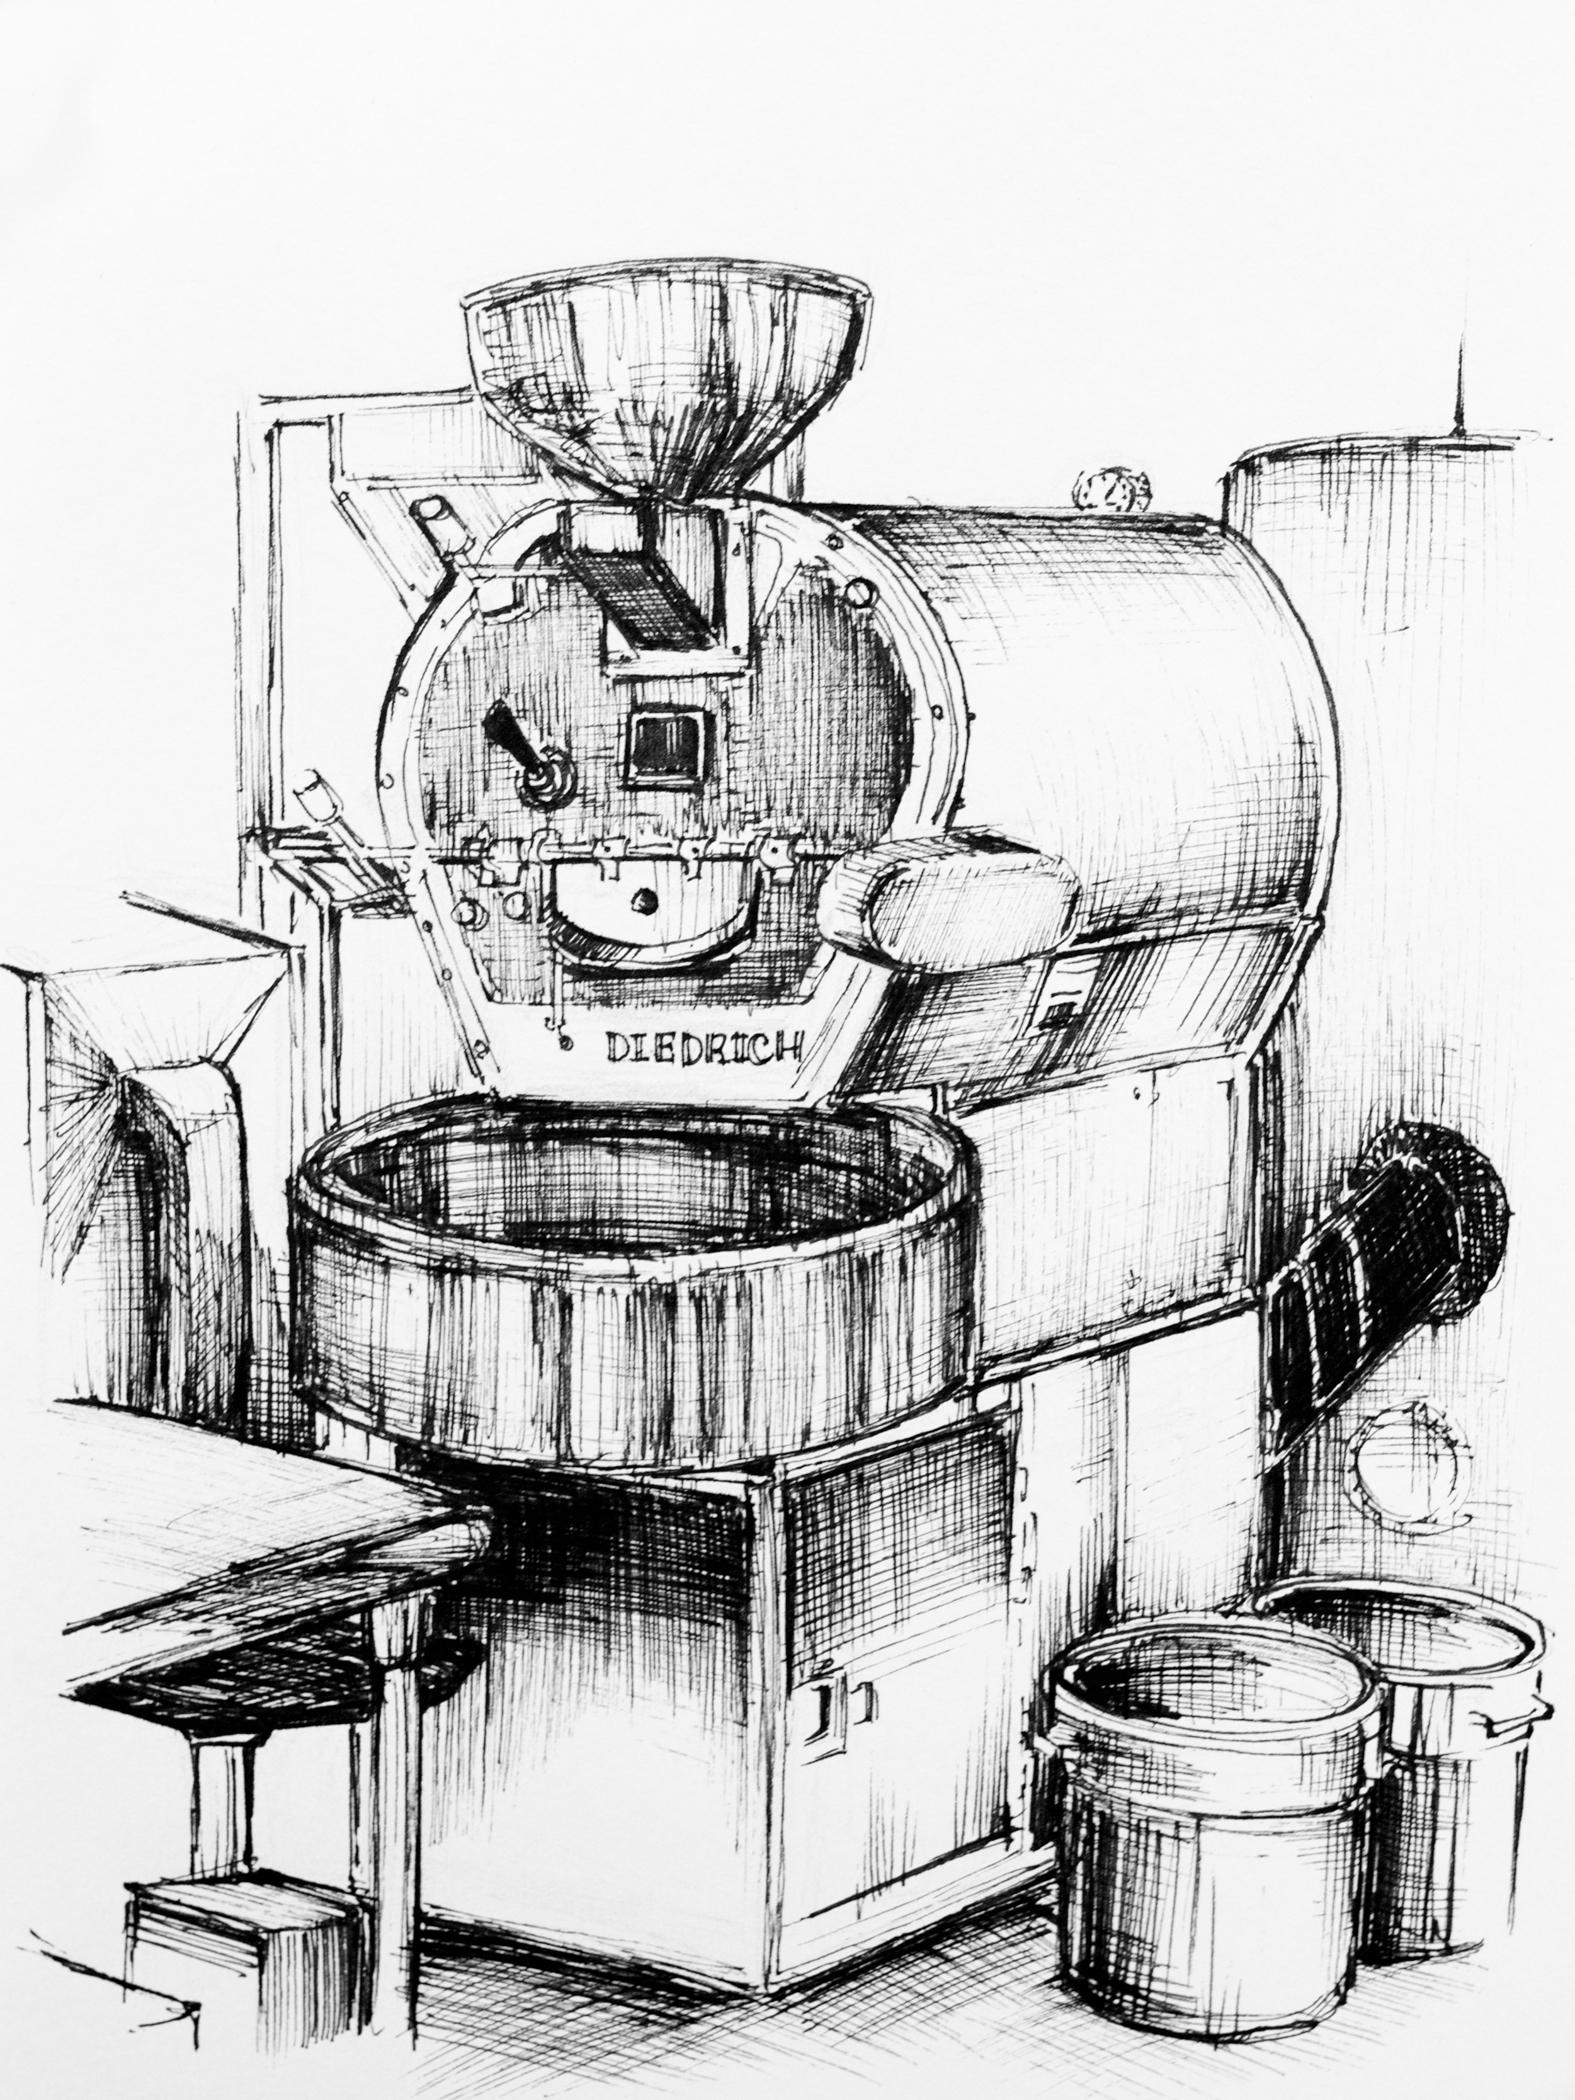 Cafe Virtuoso. Illustration by Mary Jhun Dandan.